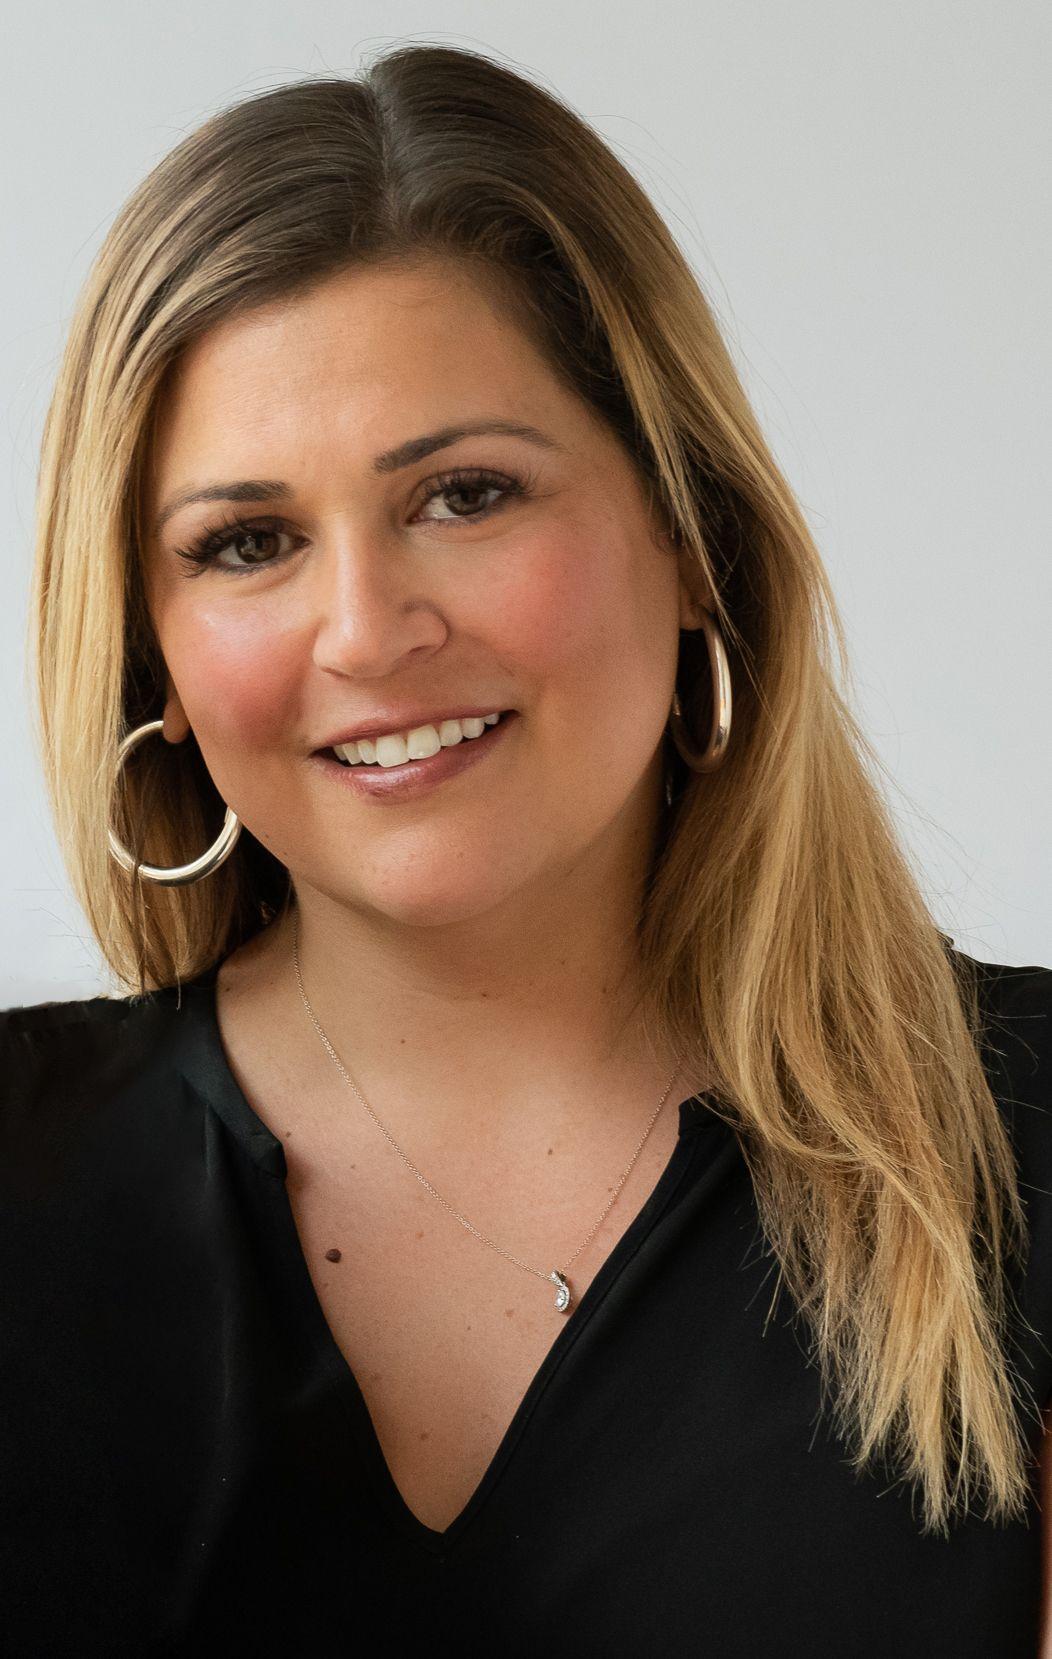 Tori Banu